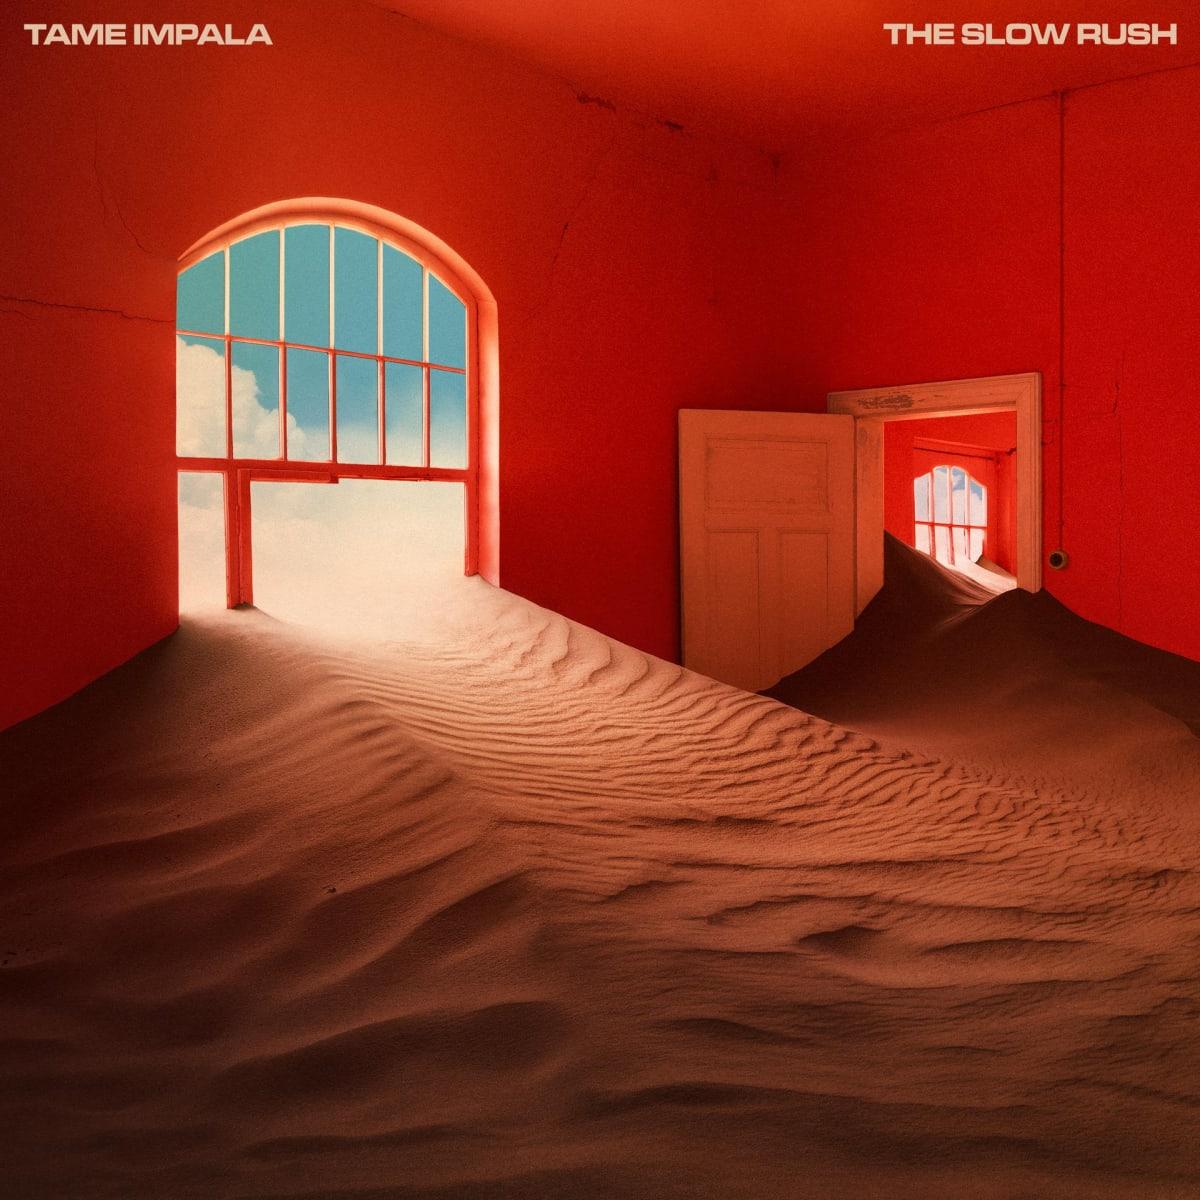 Album Review: Tame Impala - The Slow Rush